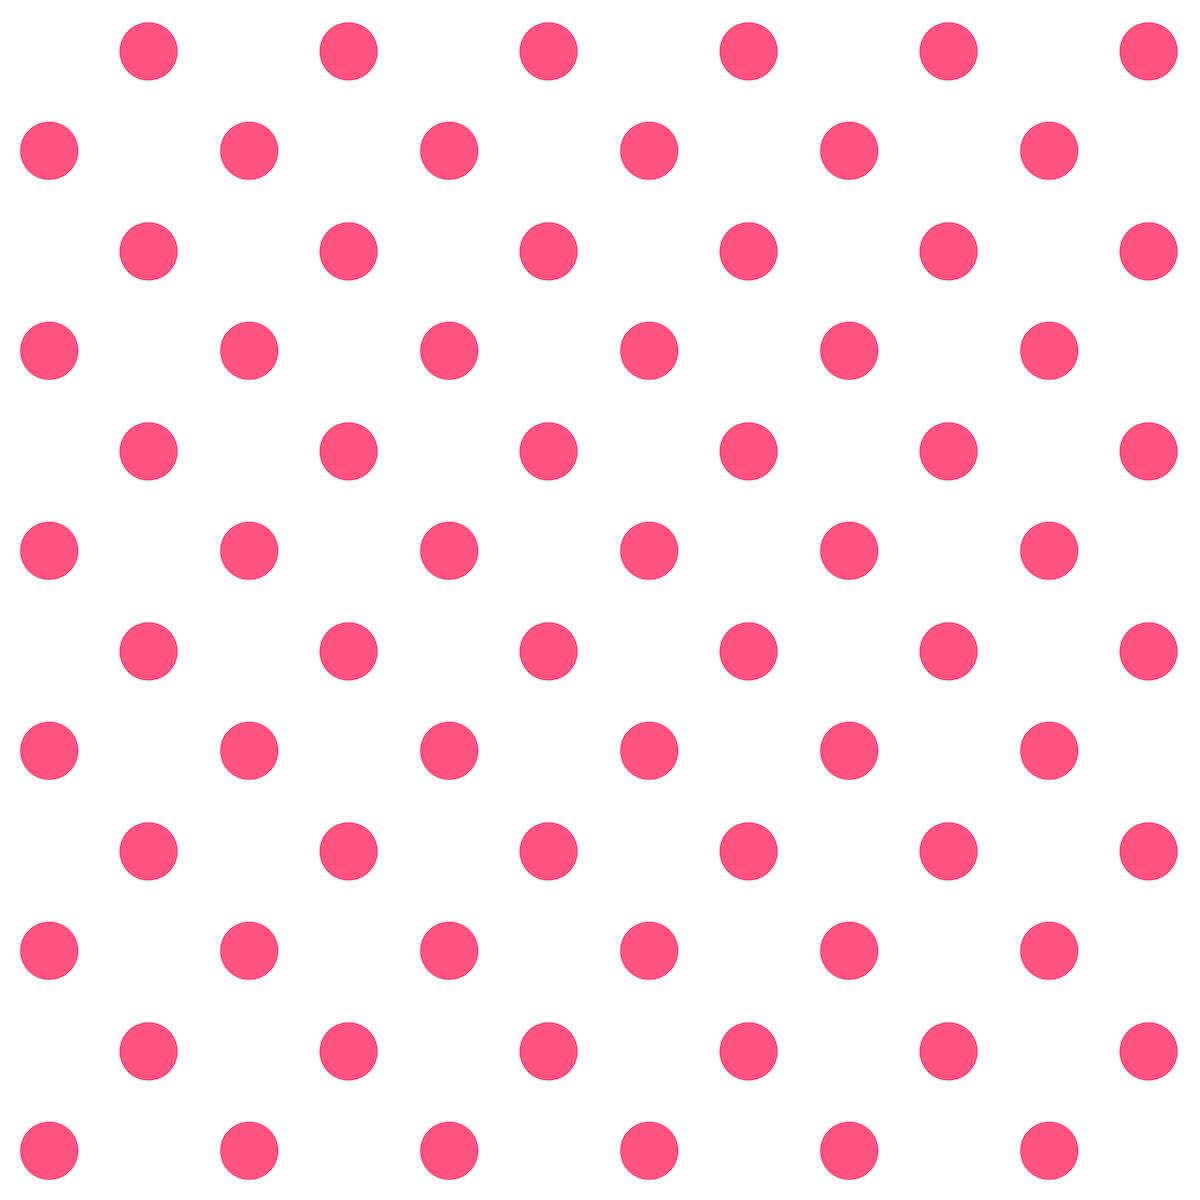 Free Digital Pink Polka Dot Scrapbooking Paper